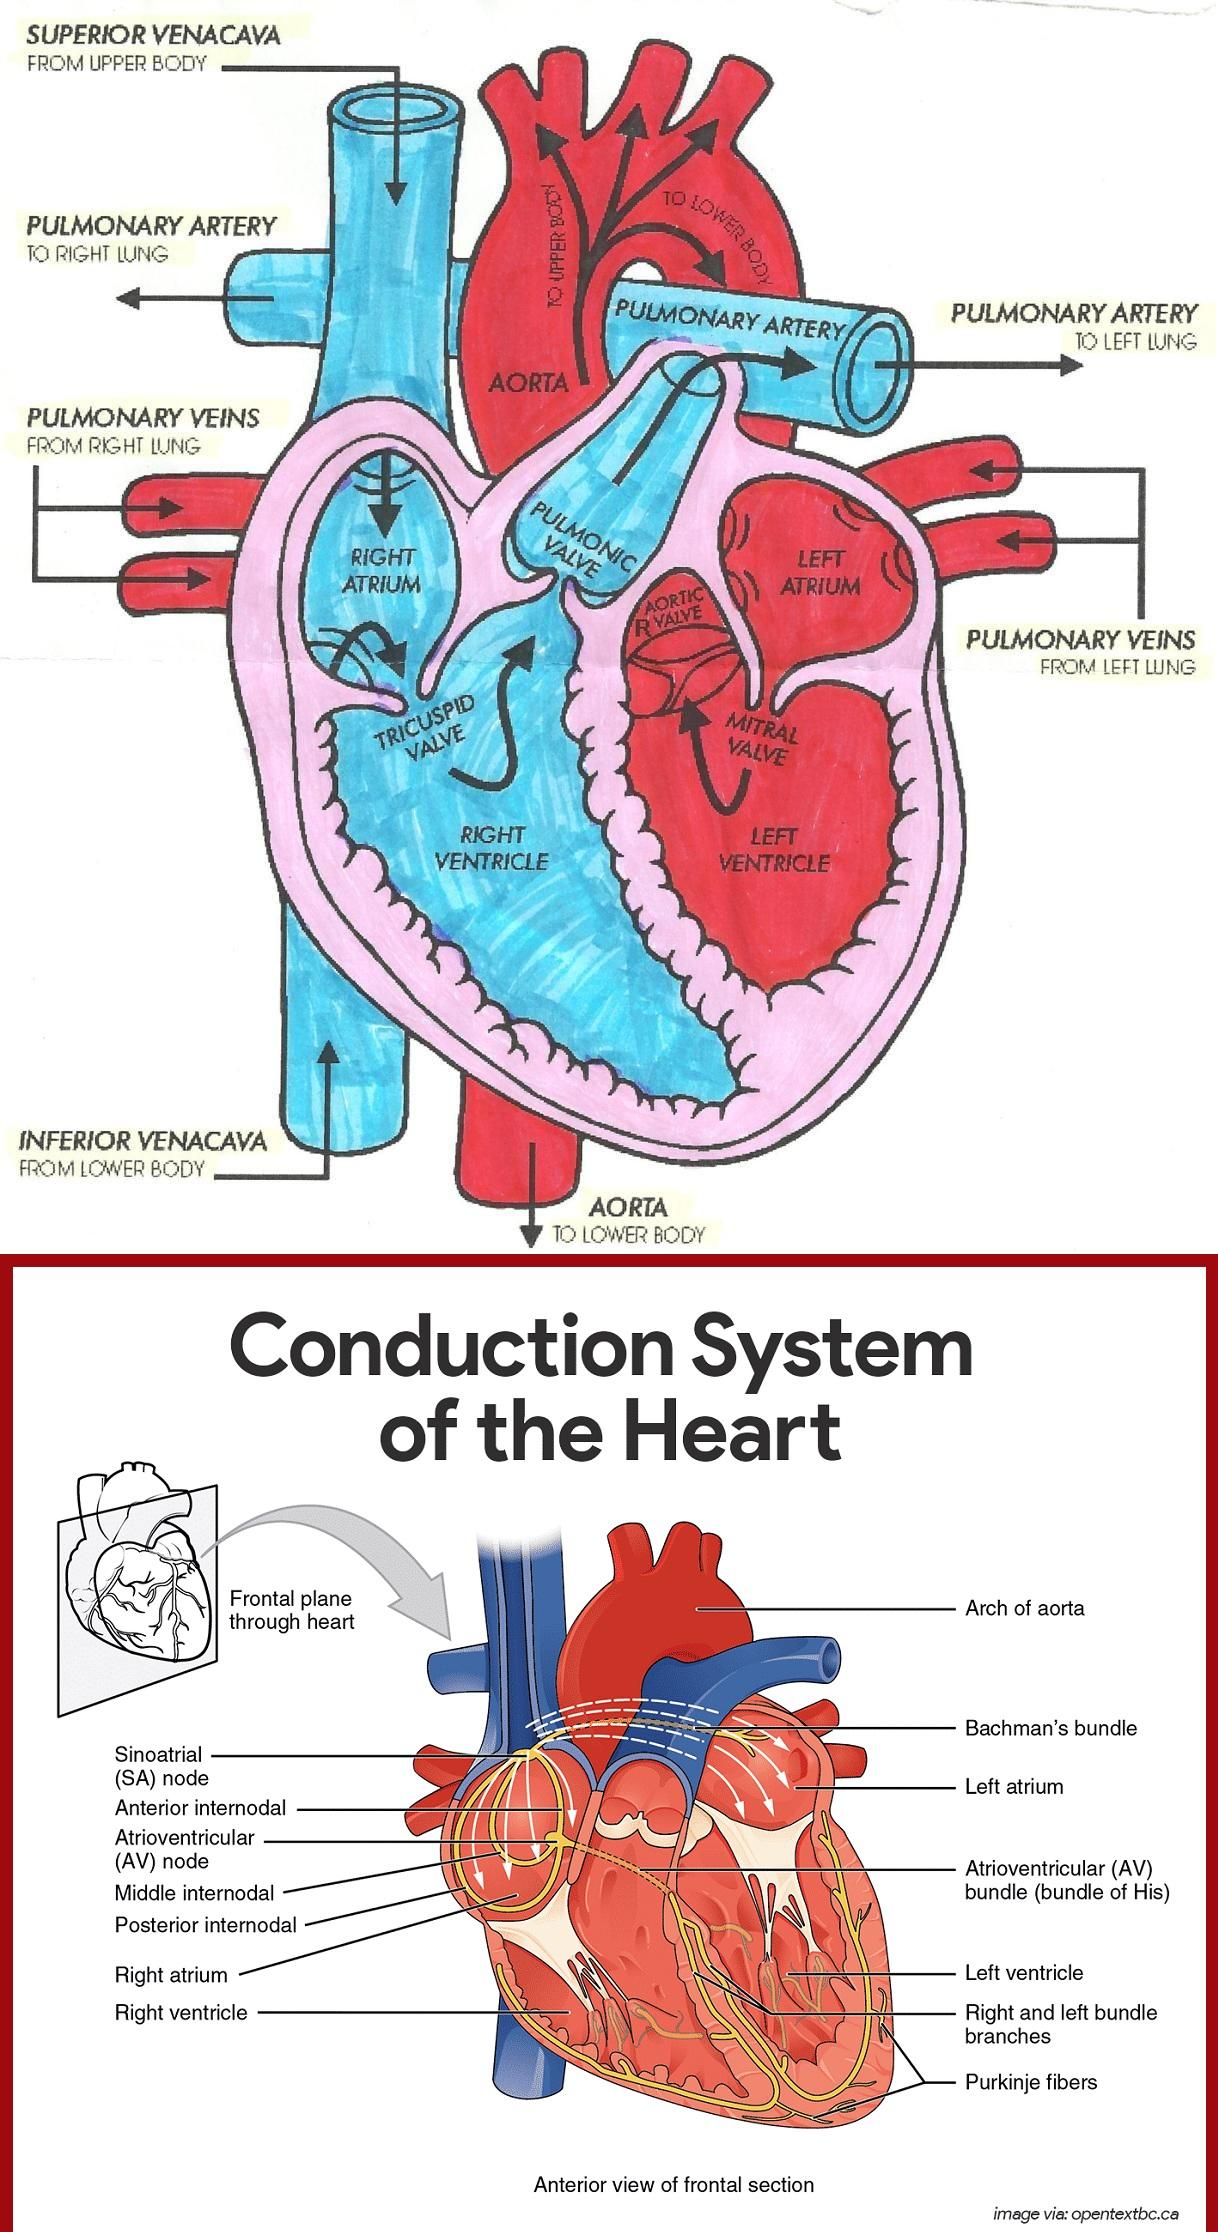 Heart Blood Flow Diagram Diagram Of Heart Blood Flow For Cardiac Nursing Students Nclex Quiz